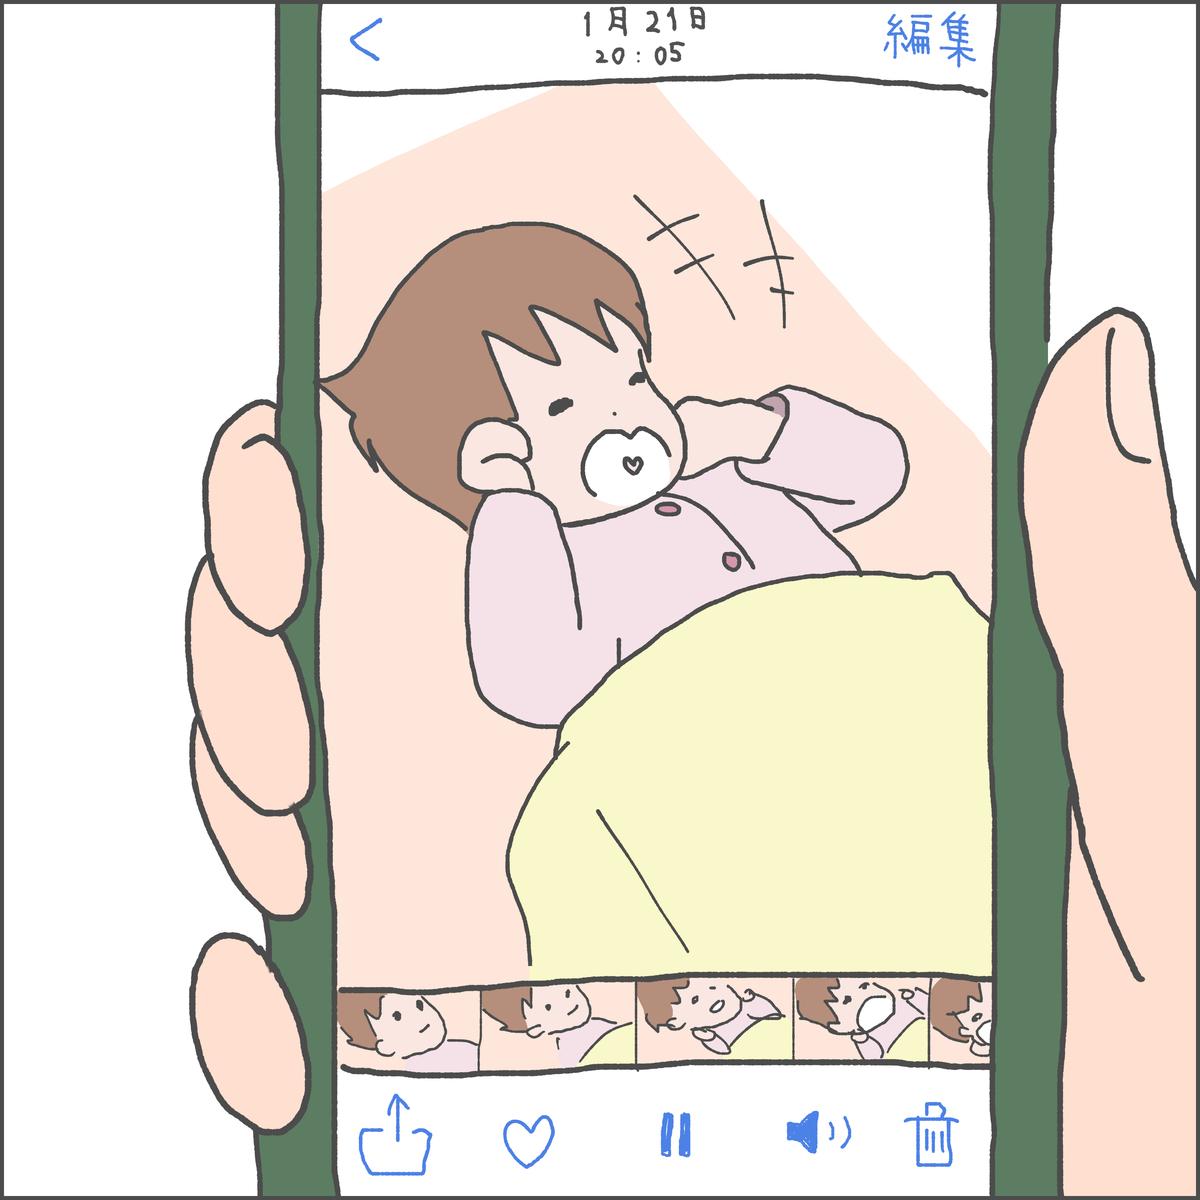 f:id:ika_yoshi:20210223222556j:plain